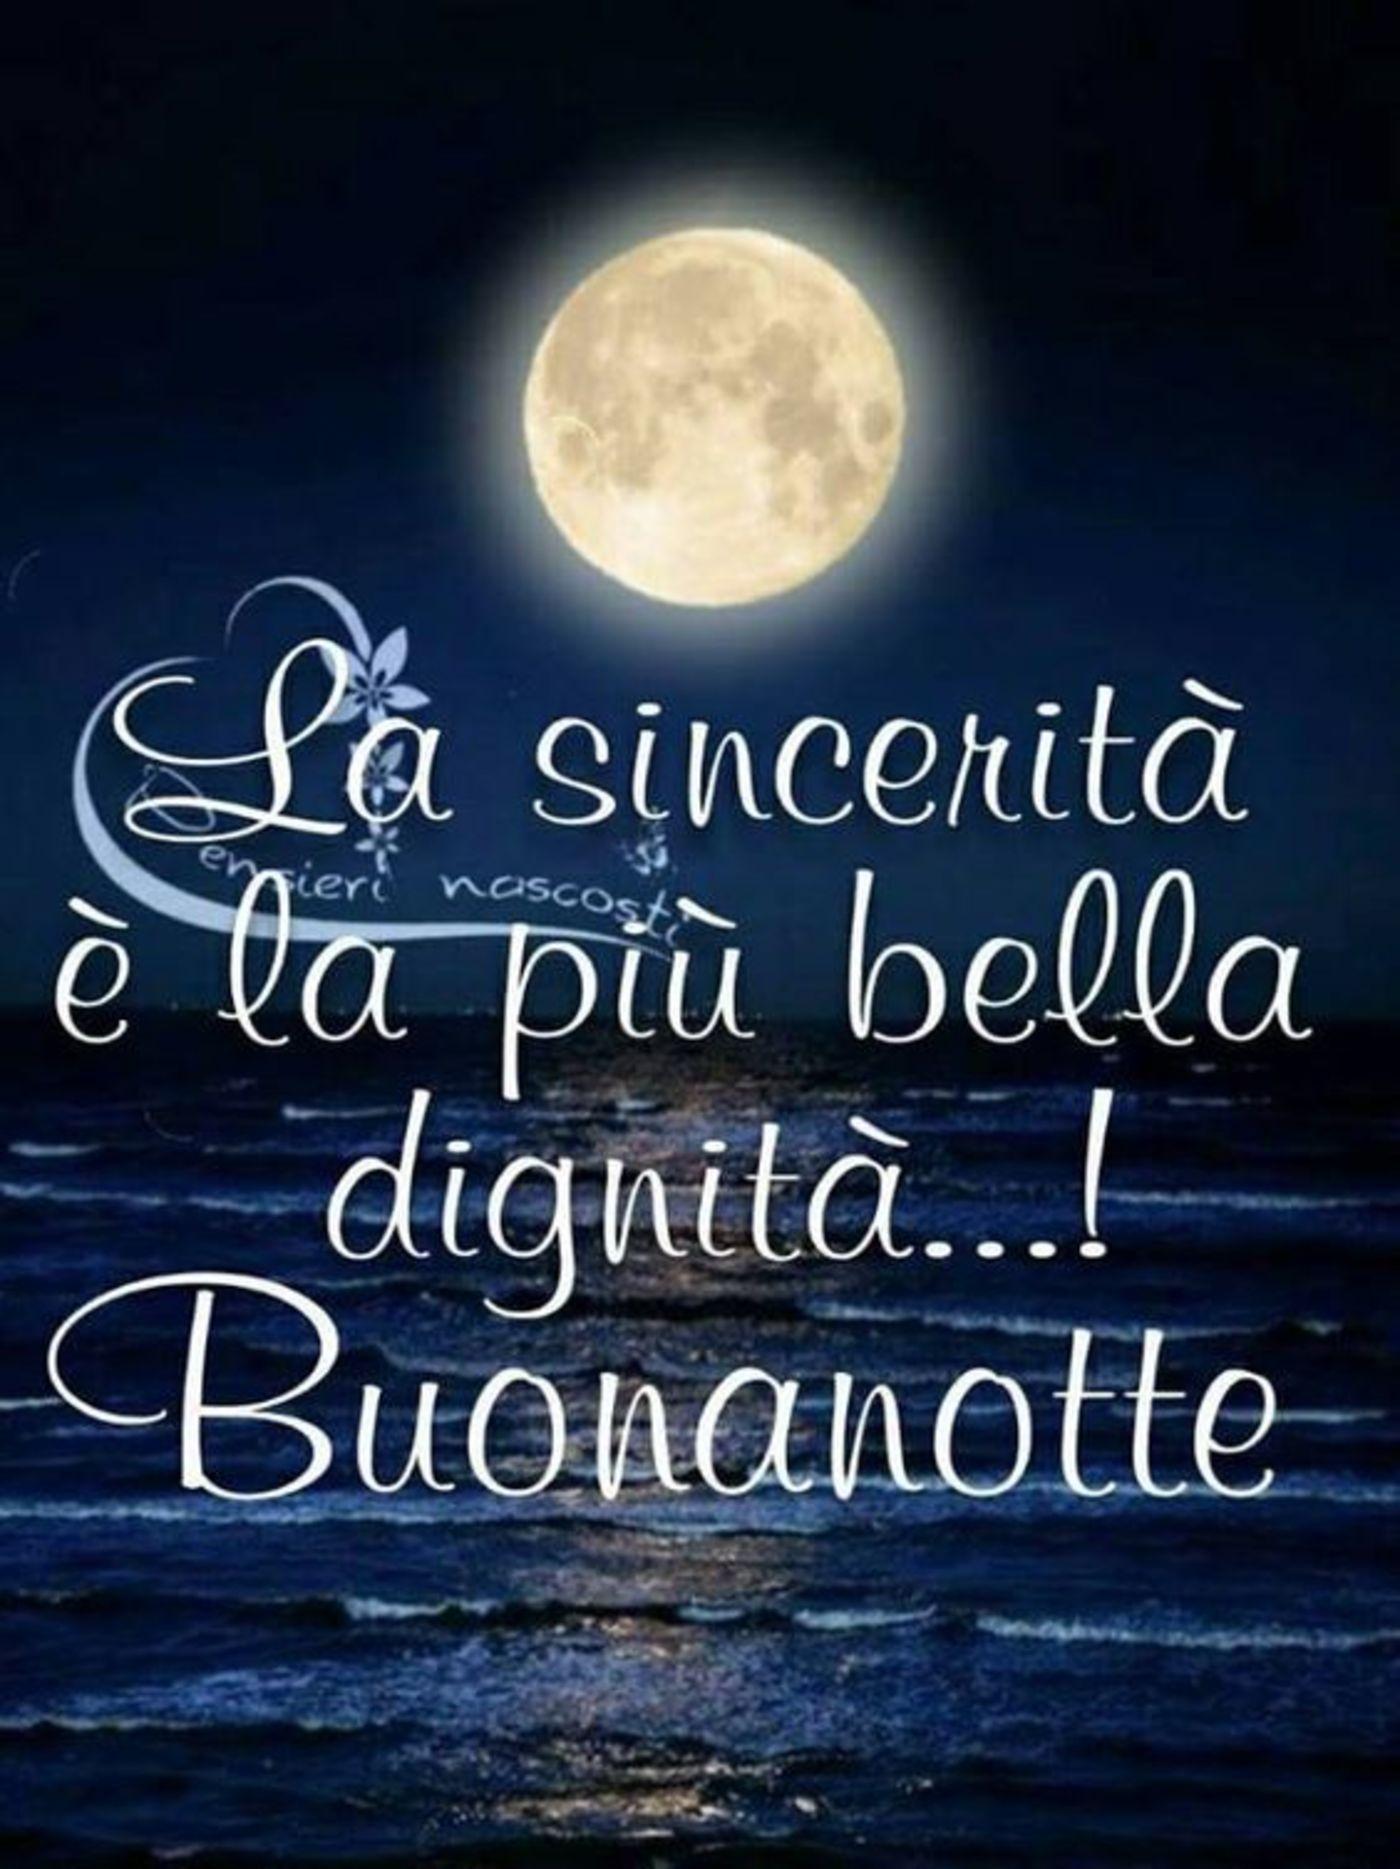 Magica Buonanotte bellissime immagini Facebook 632